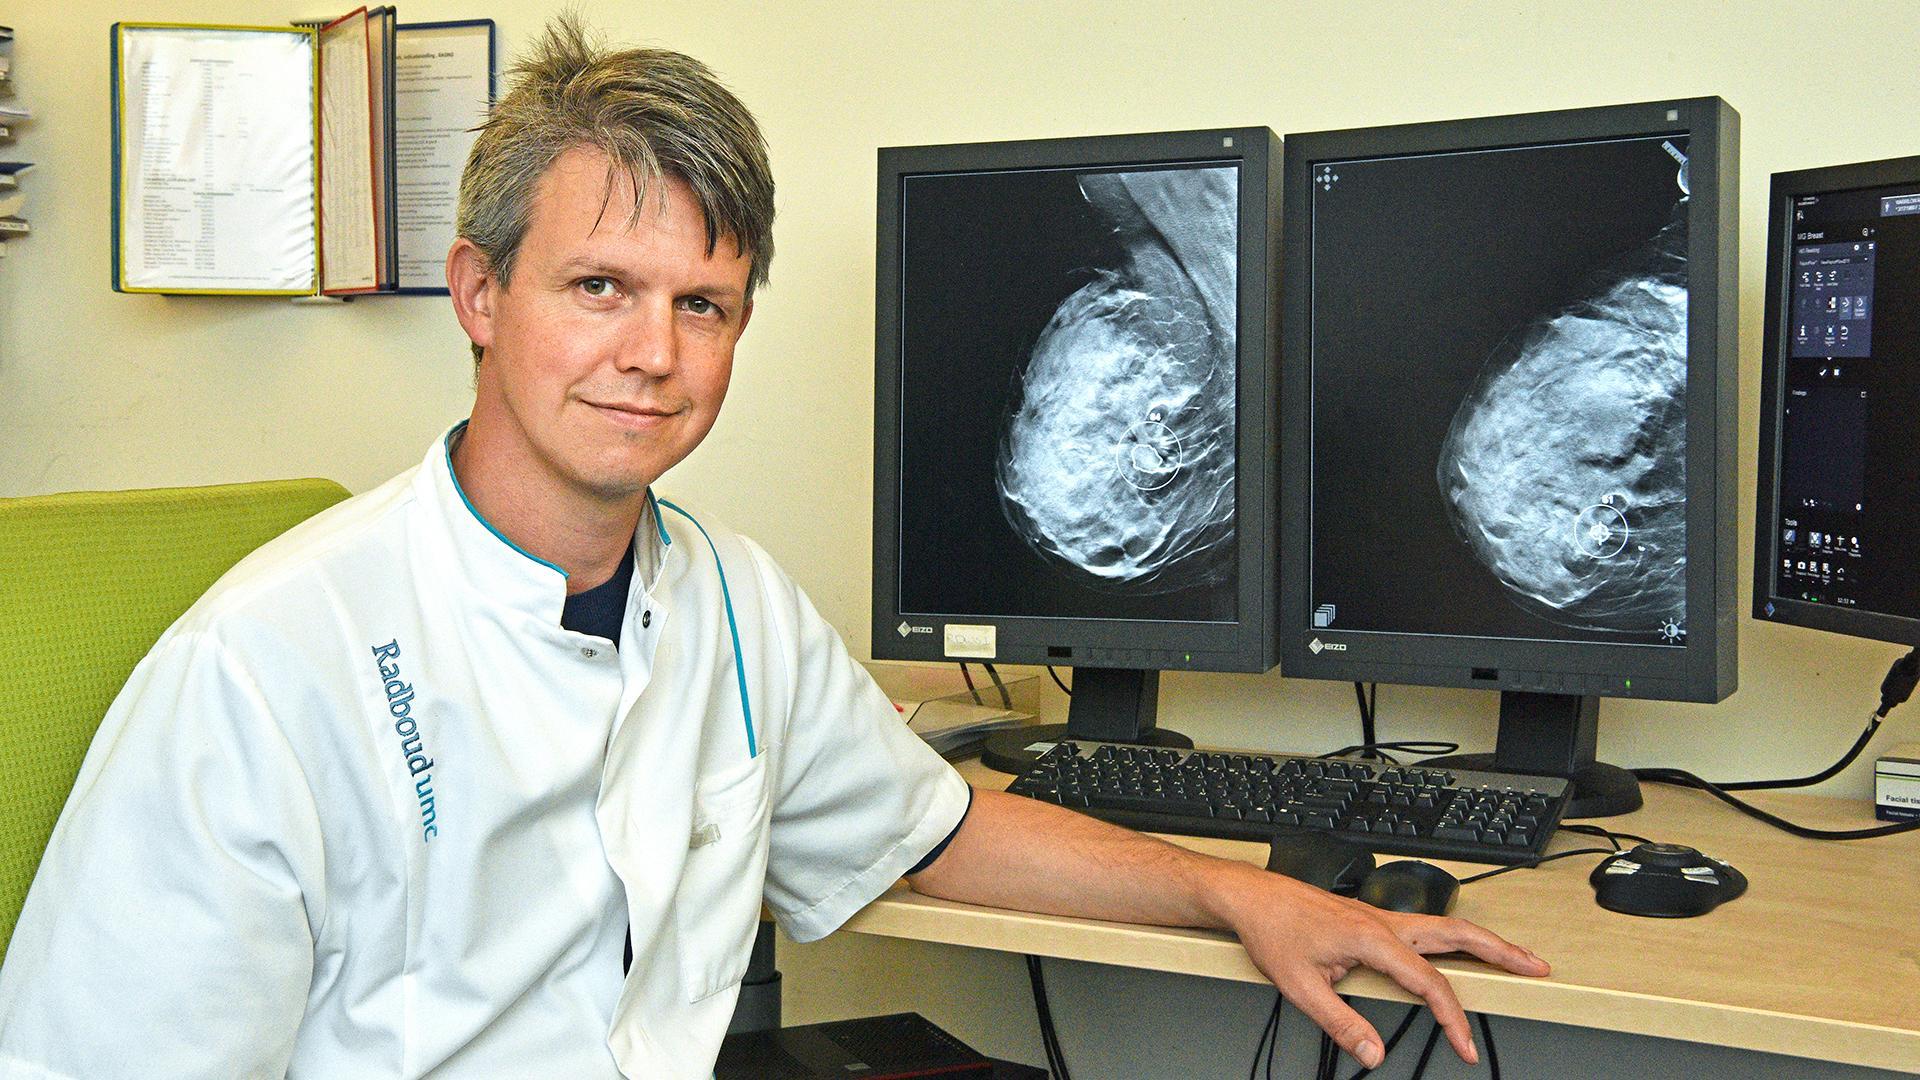 Ritse Mann, radioloog Radboudumc